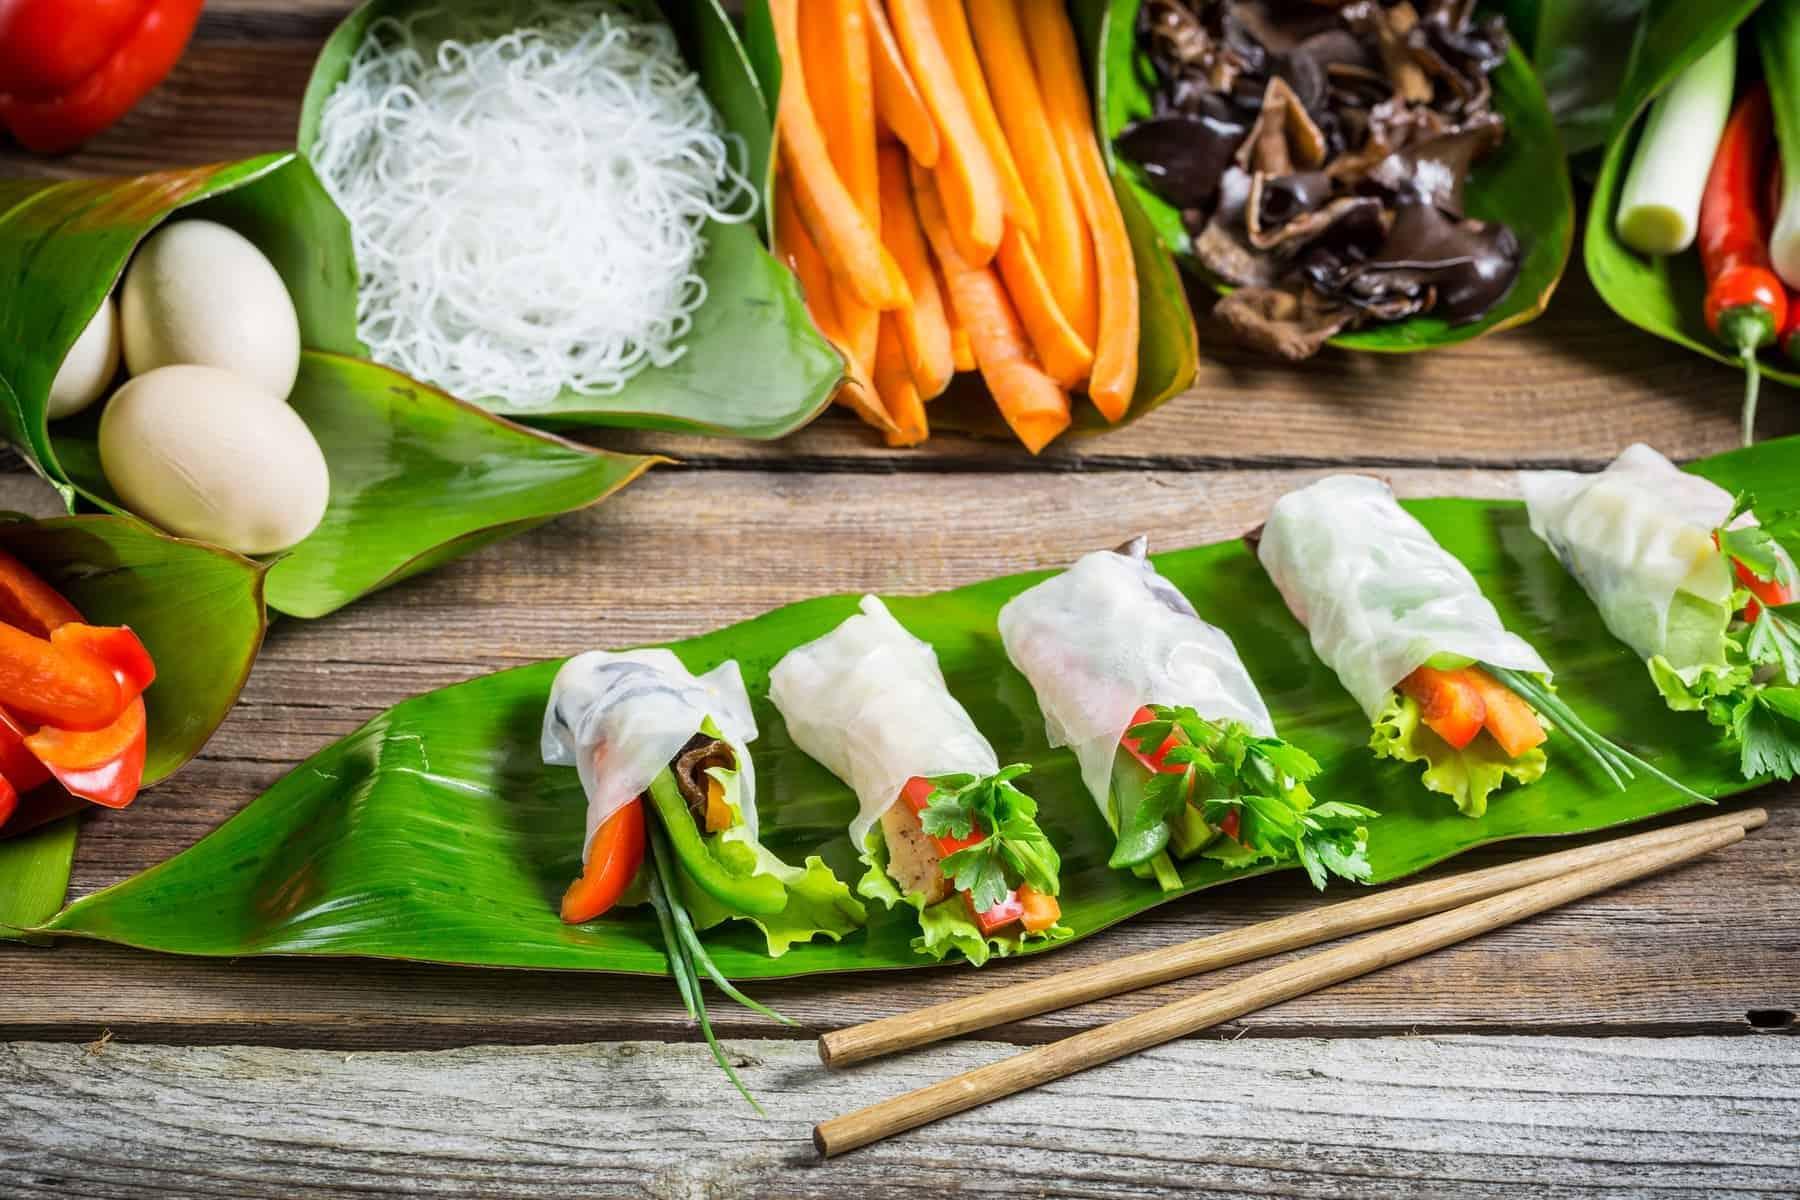 Vietnamese food: Spring rolls with vegetables and chicken. Spring rolls with vegetables and chicken